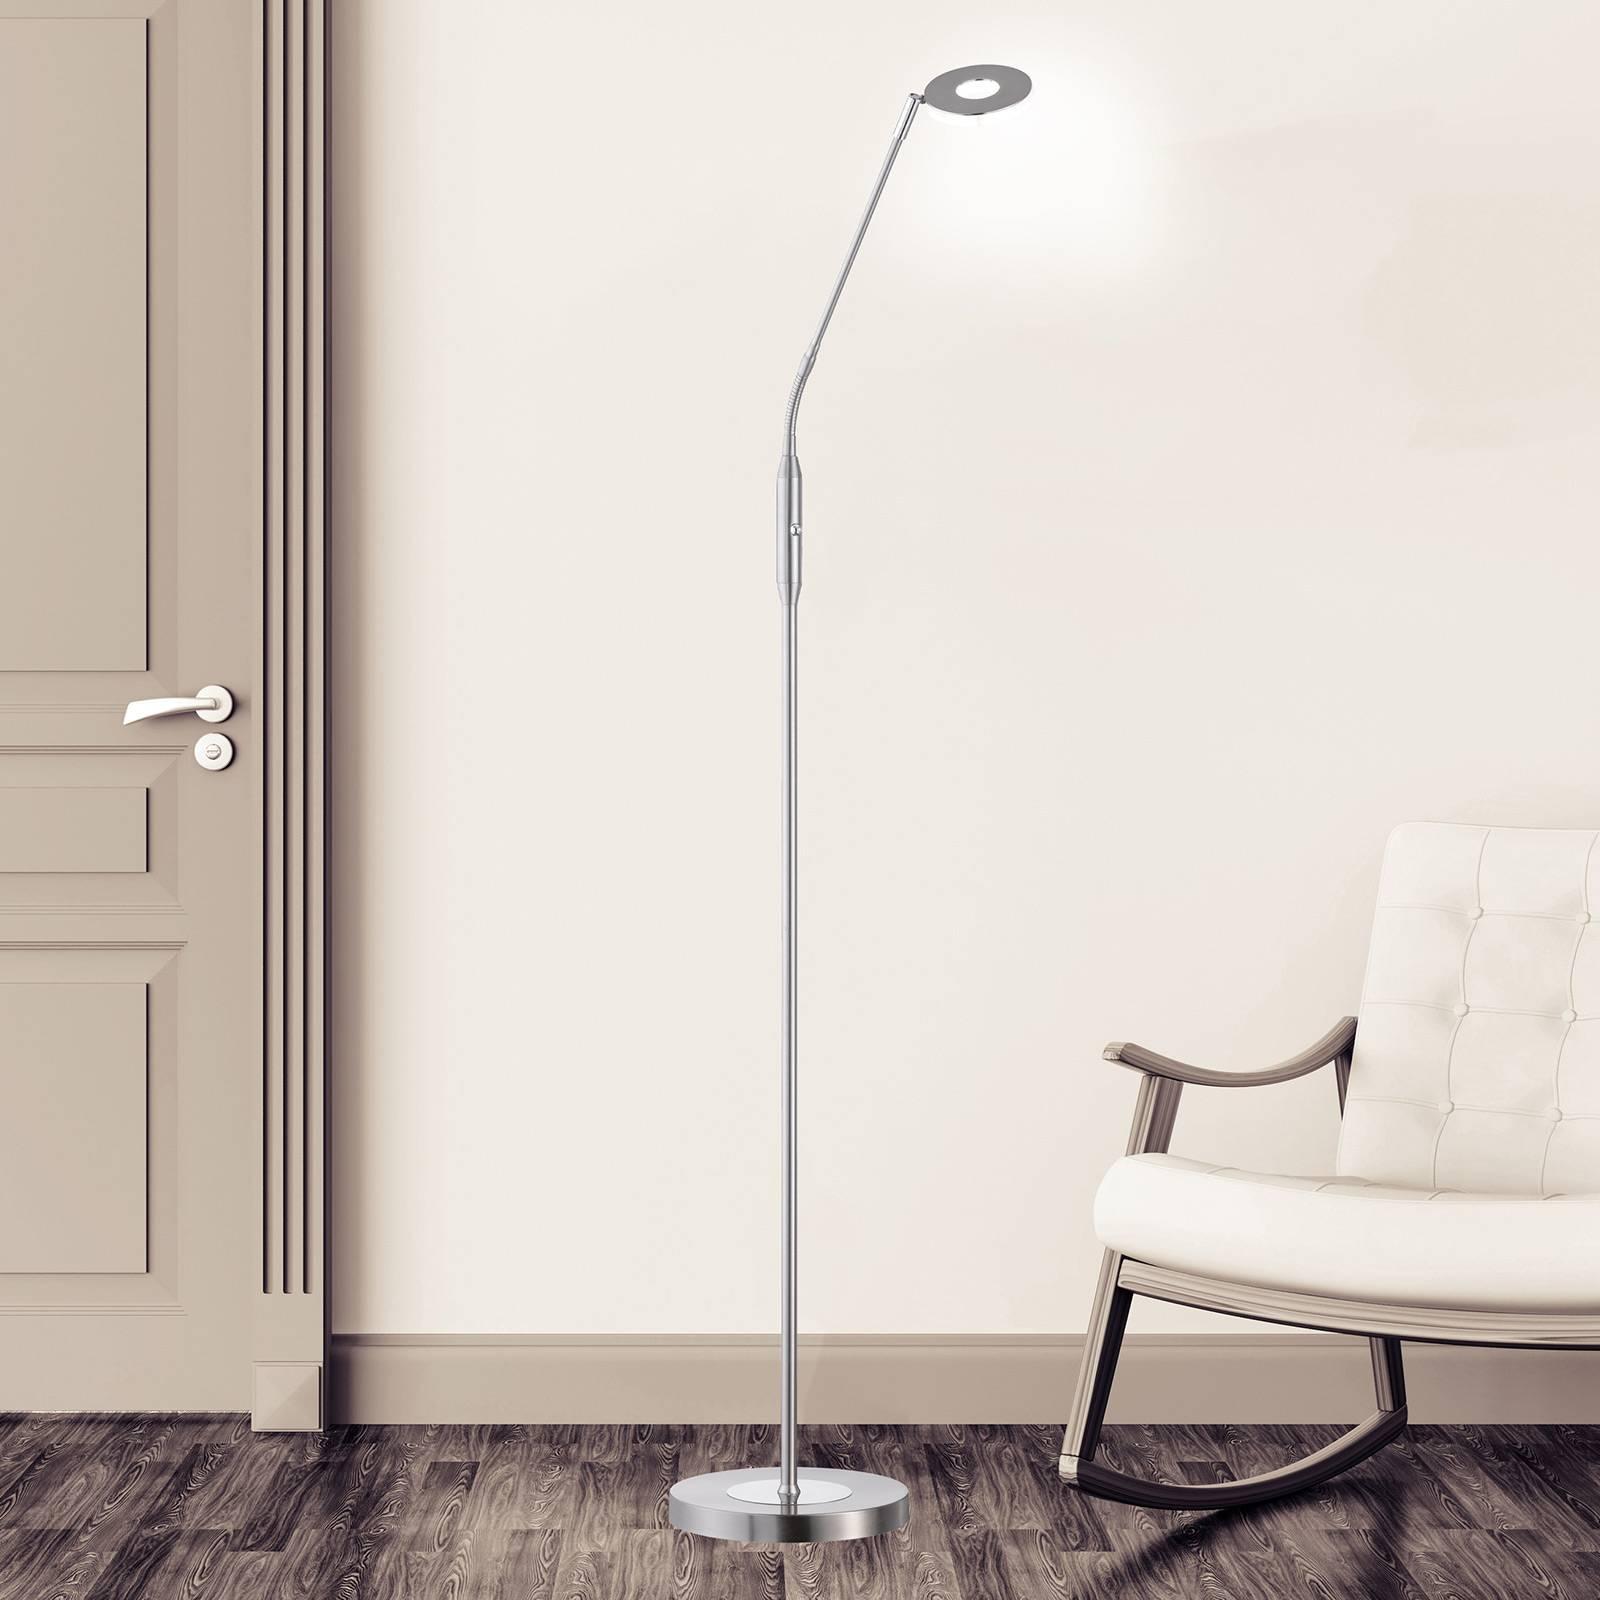 Lampadaire LED Dent, CCT, à 1 lampe, nickel